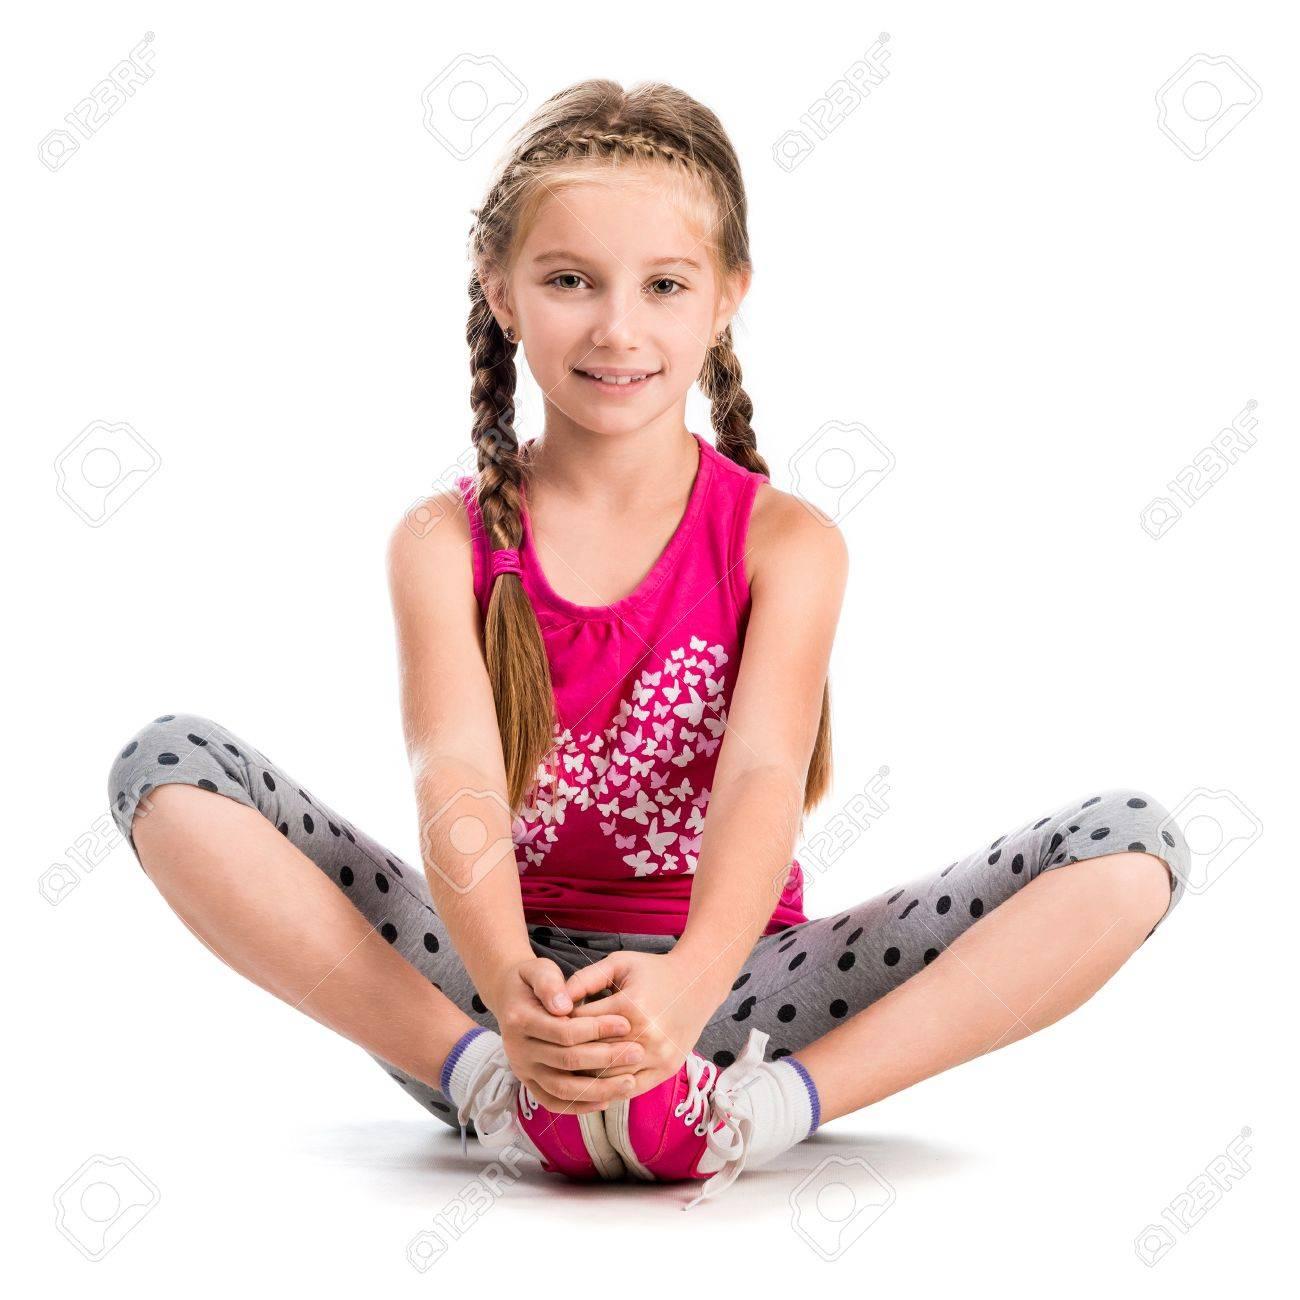 little girl doing yoga isolated on white background - 47390318